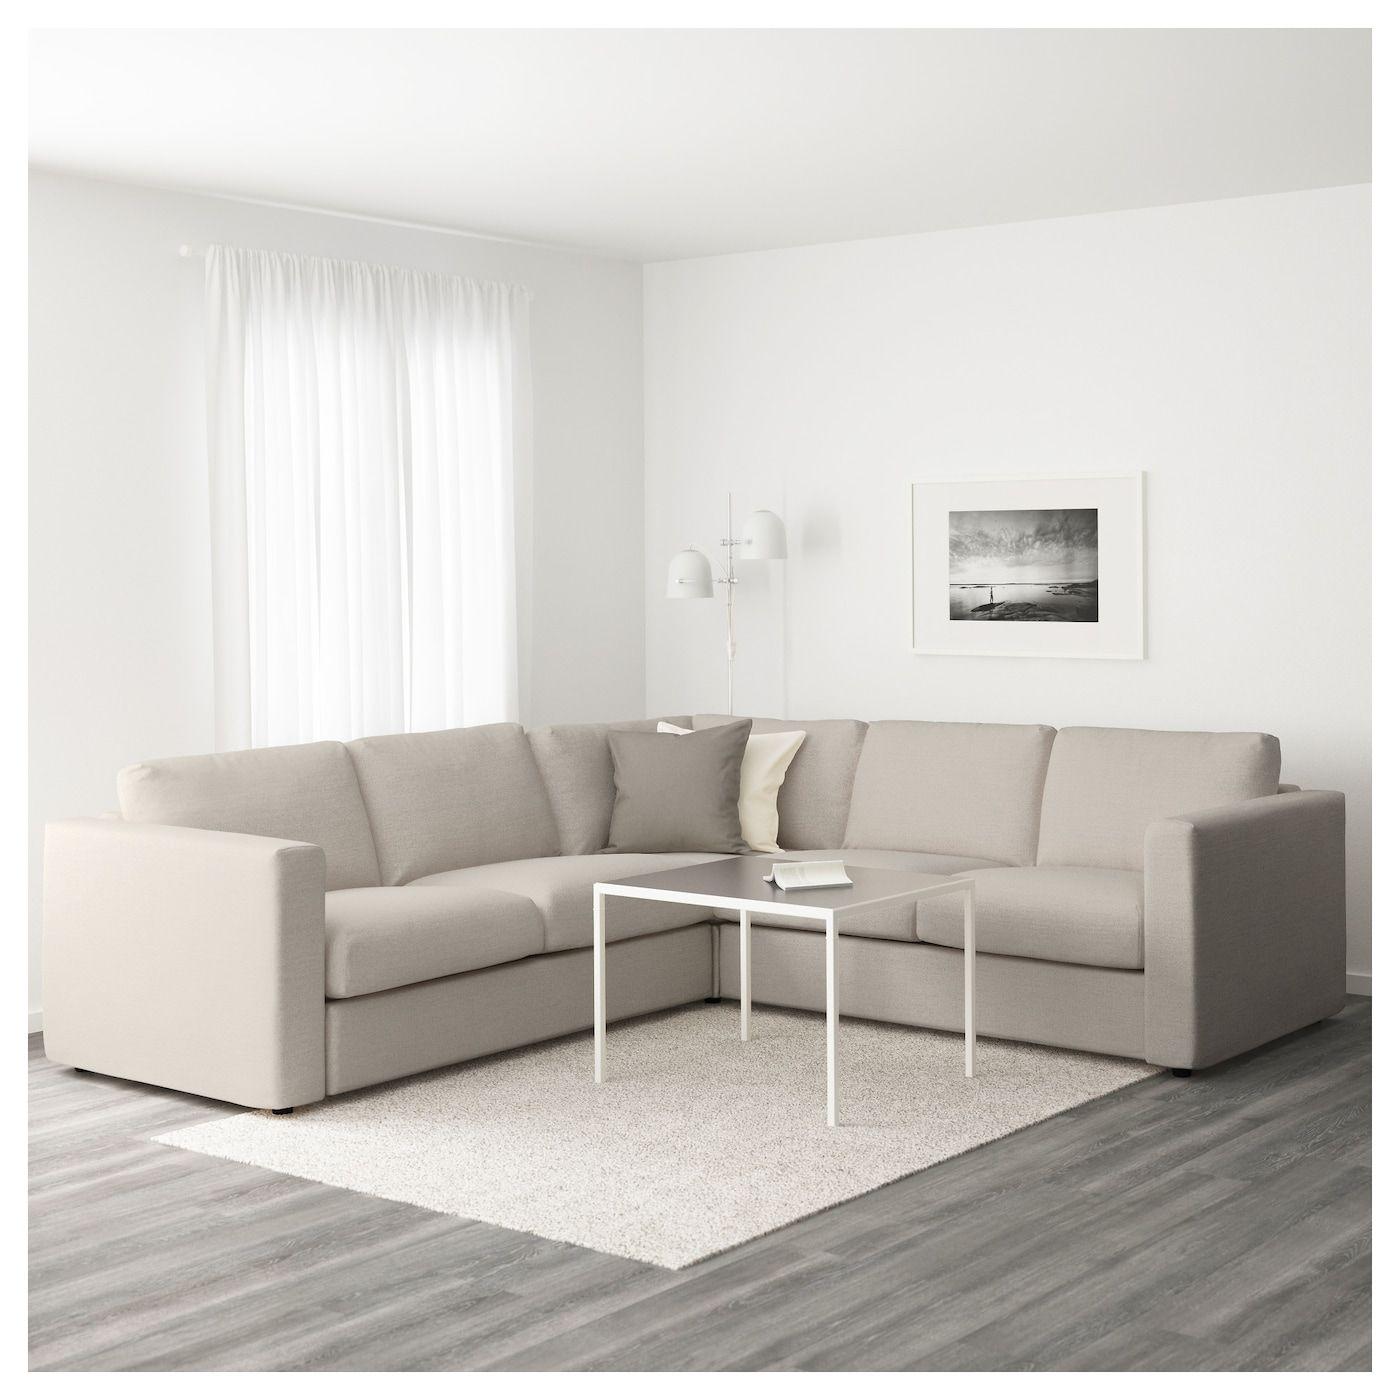 IKEA VIMLE Sectional, 4seat corner Gunnared beige